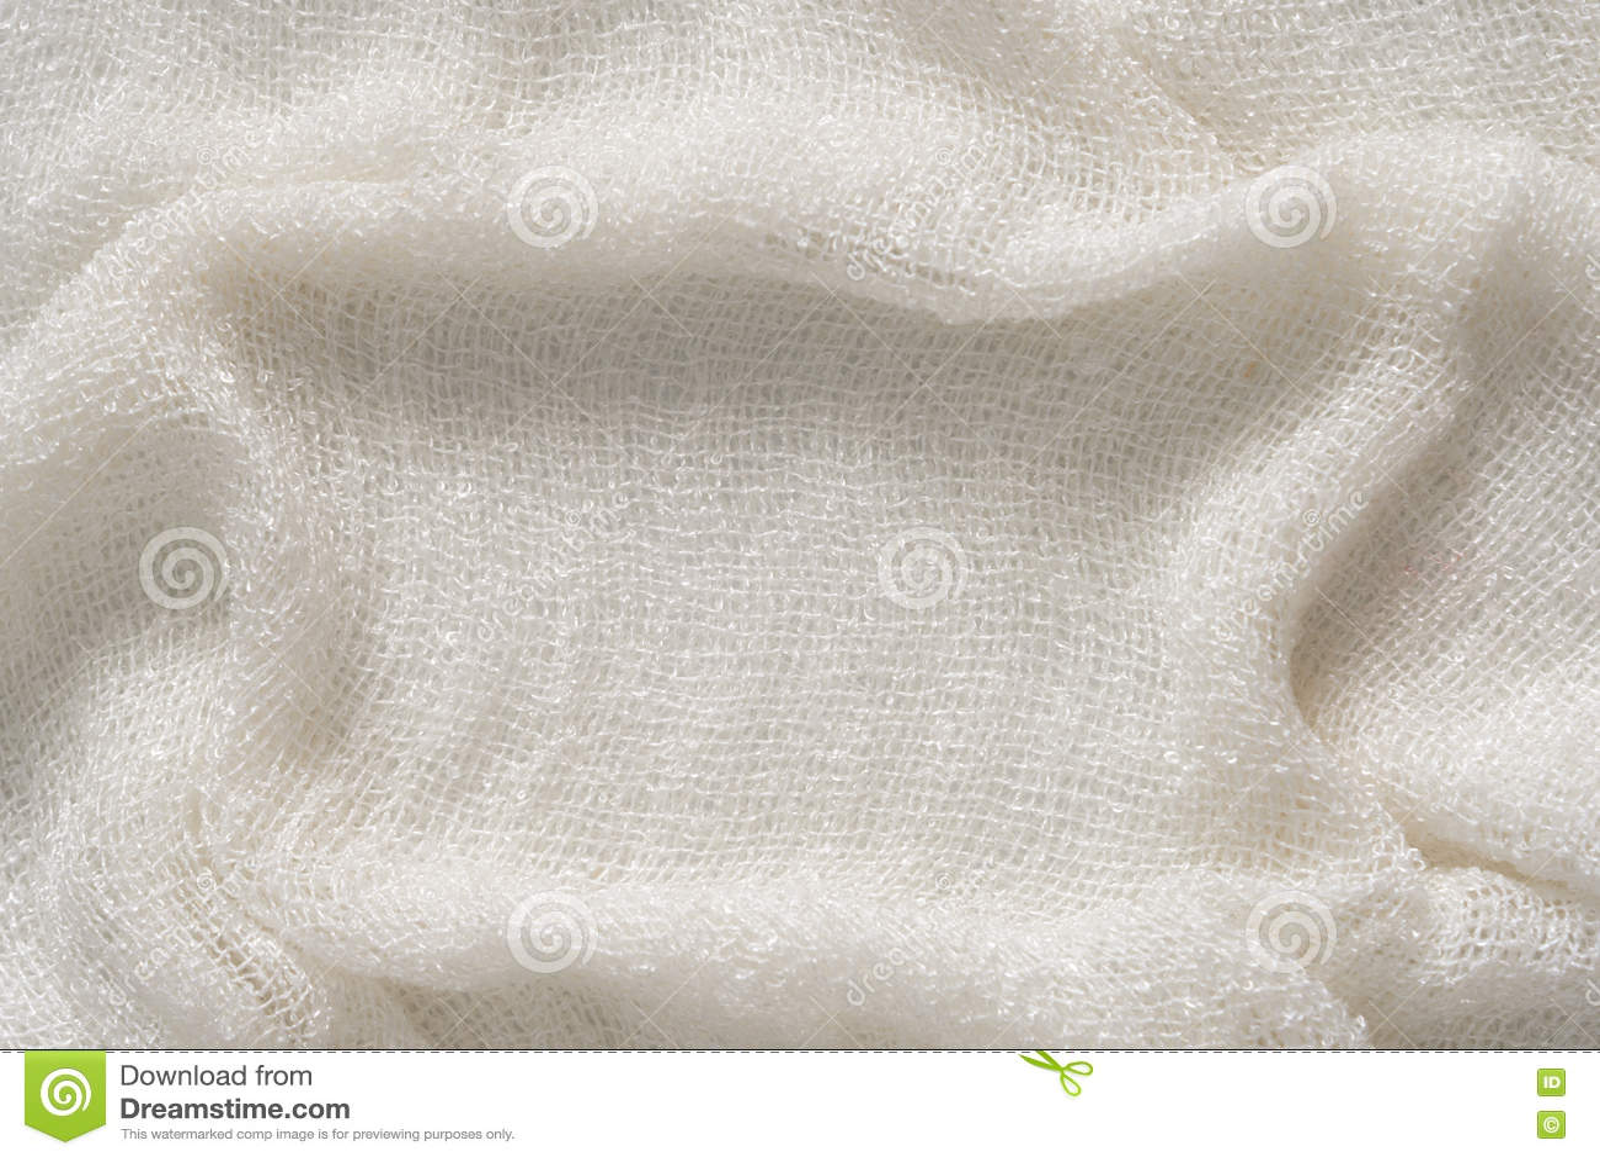 white cotton cloth background - photo #10